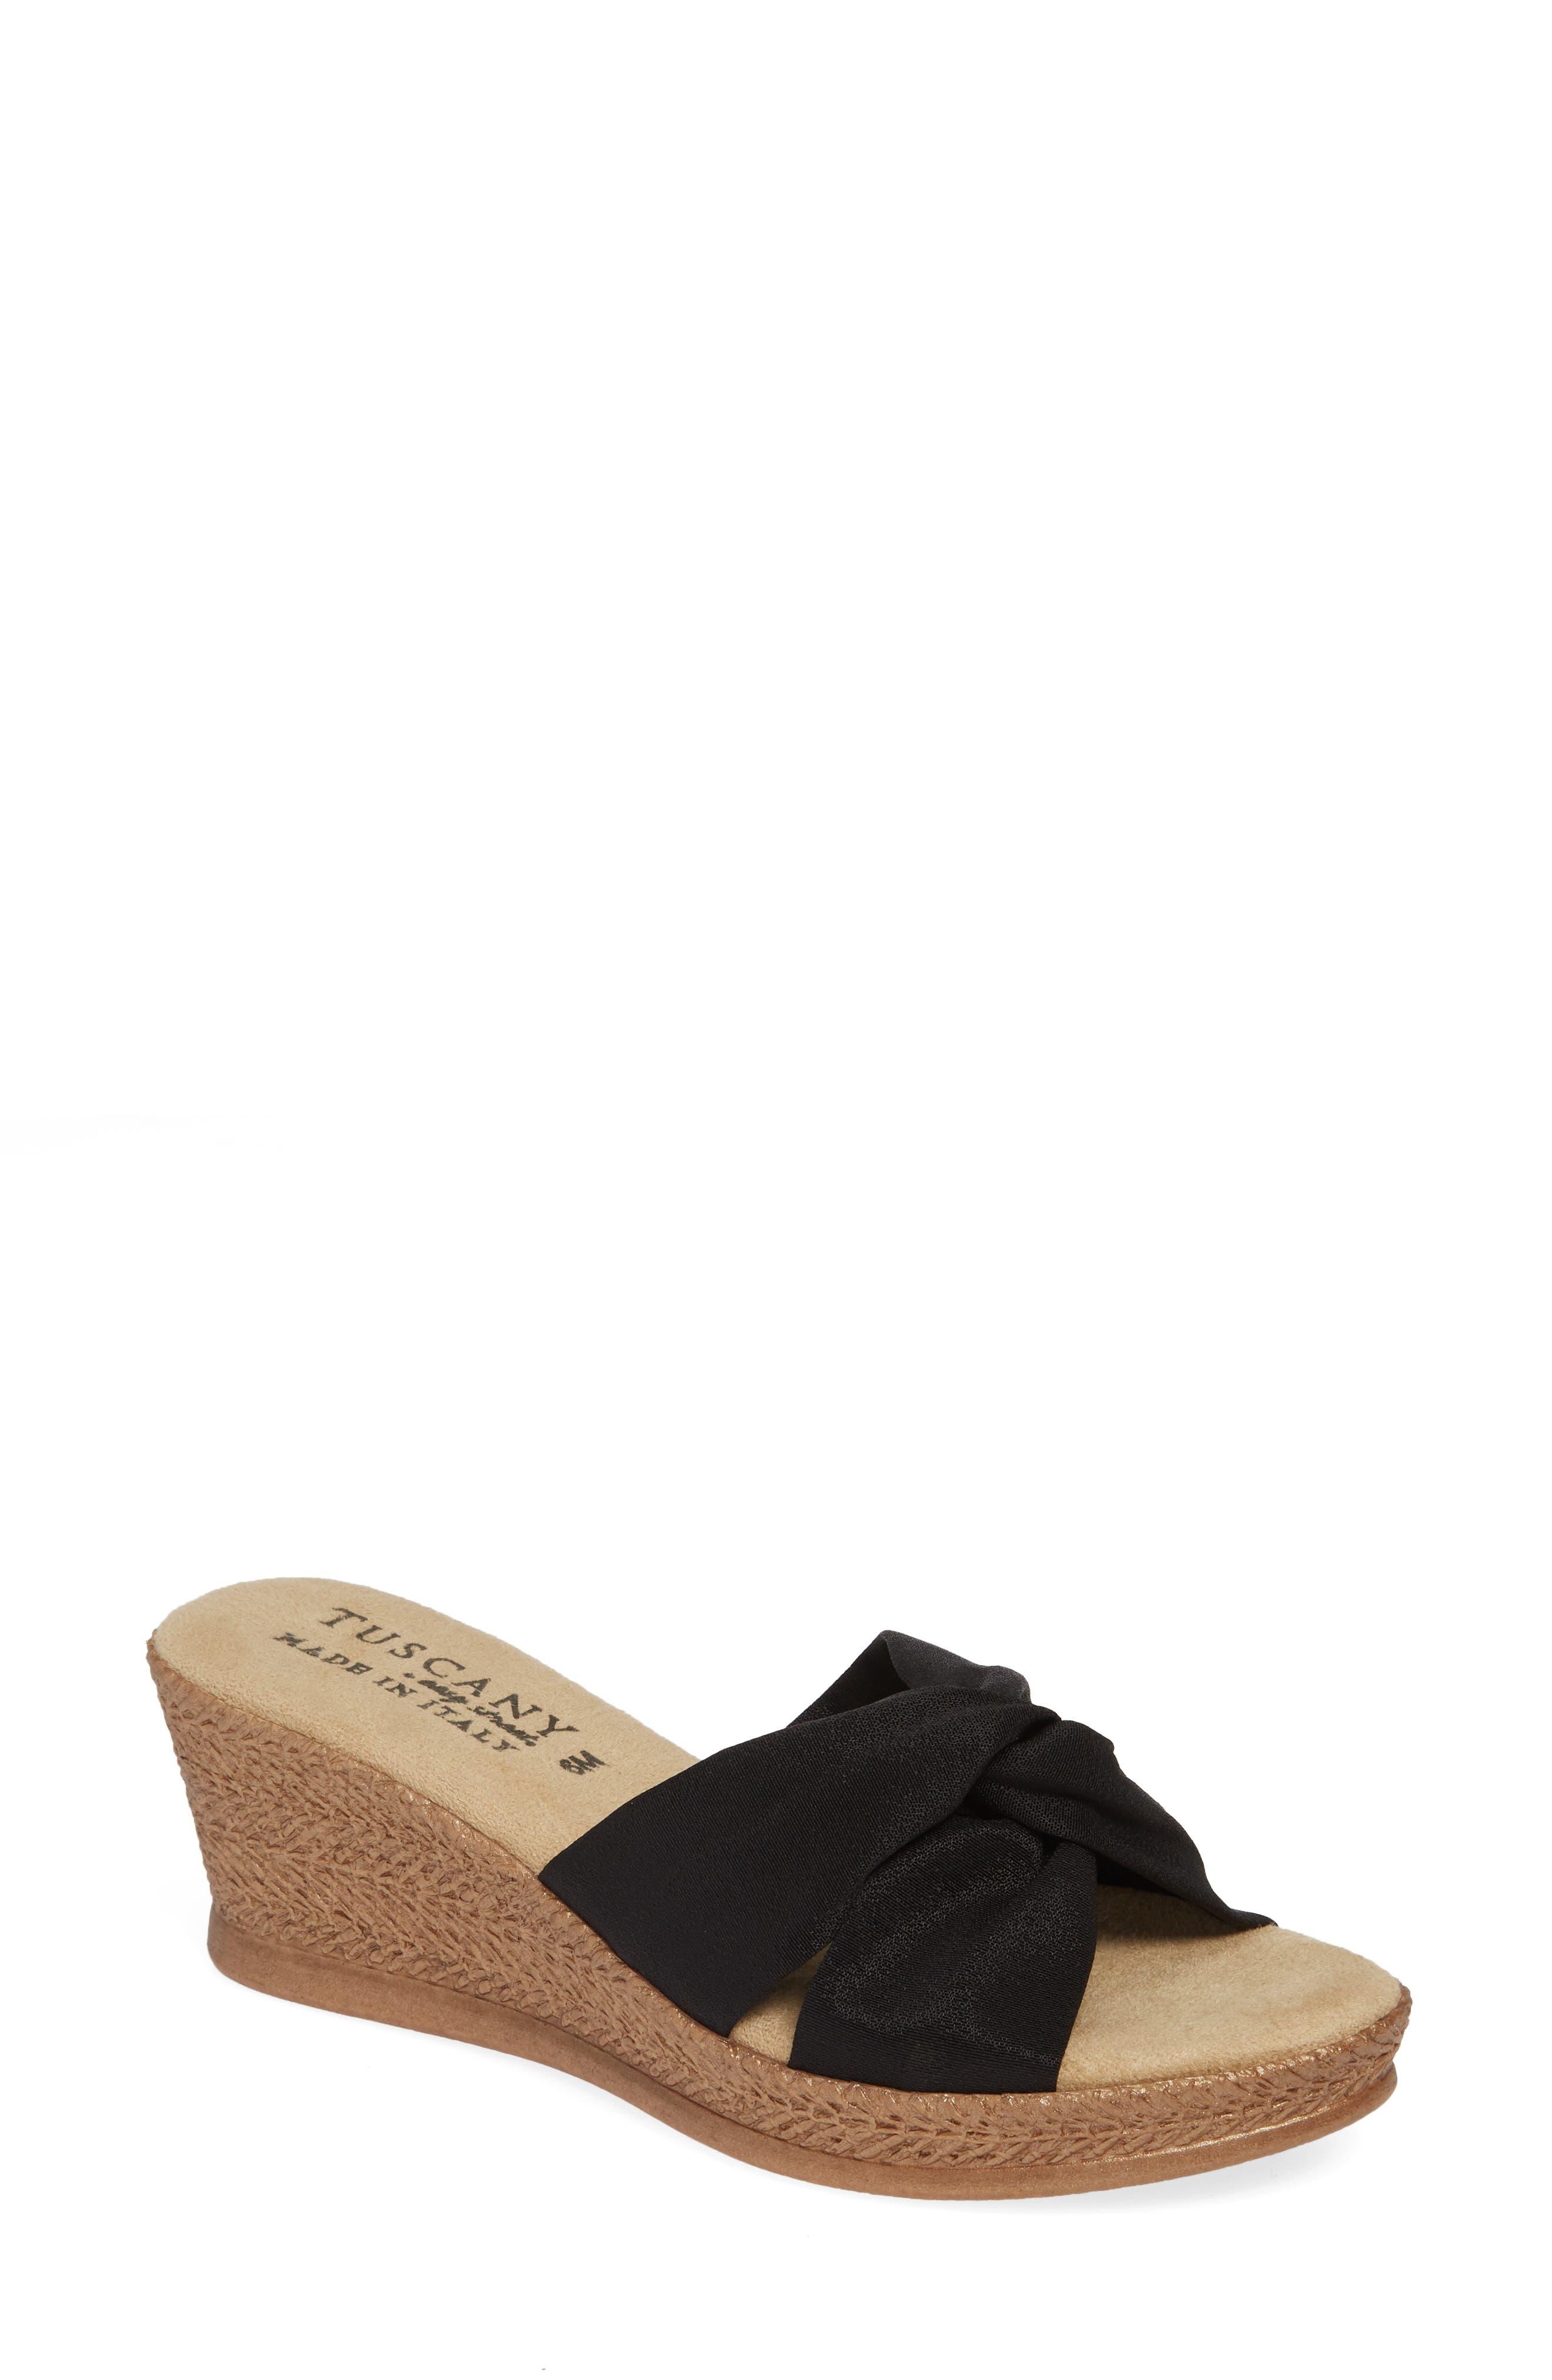 TUSCANY BY EASY STREET<SUP>®</SUP> Dinah Platform Wedge Sandal, Main, color, BLACK FABRIC